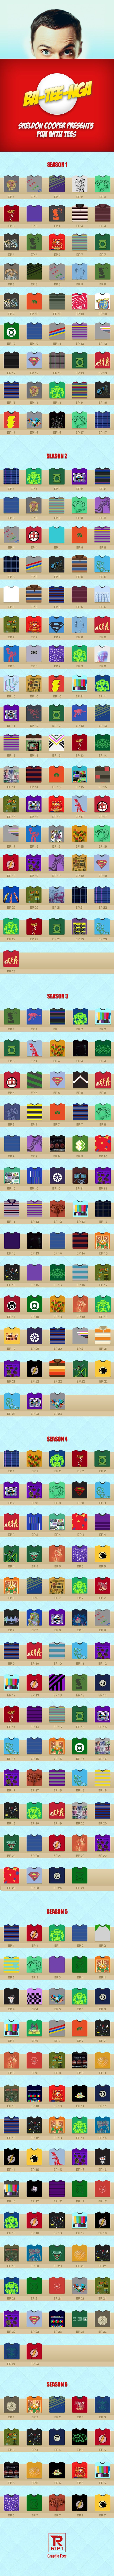 Every T-Shirt Sheldon Has Worn. BigBangTheory! This took a lot of time!